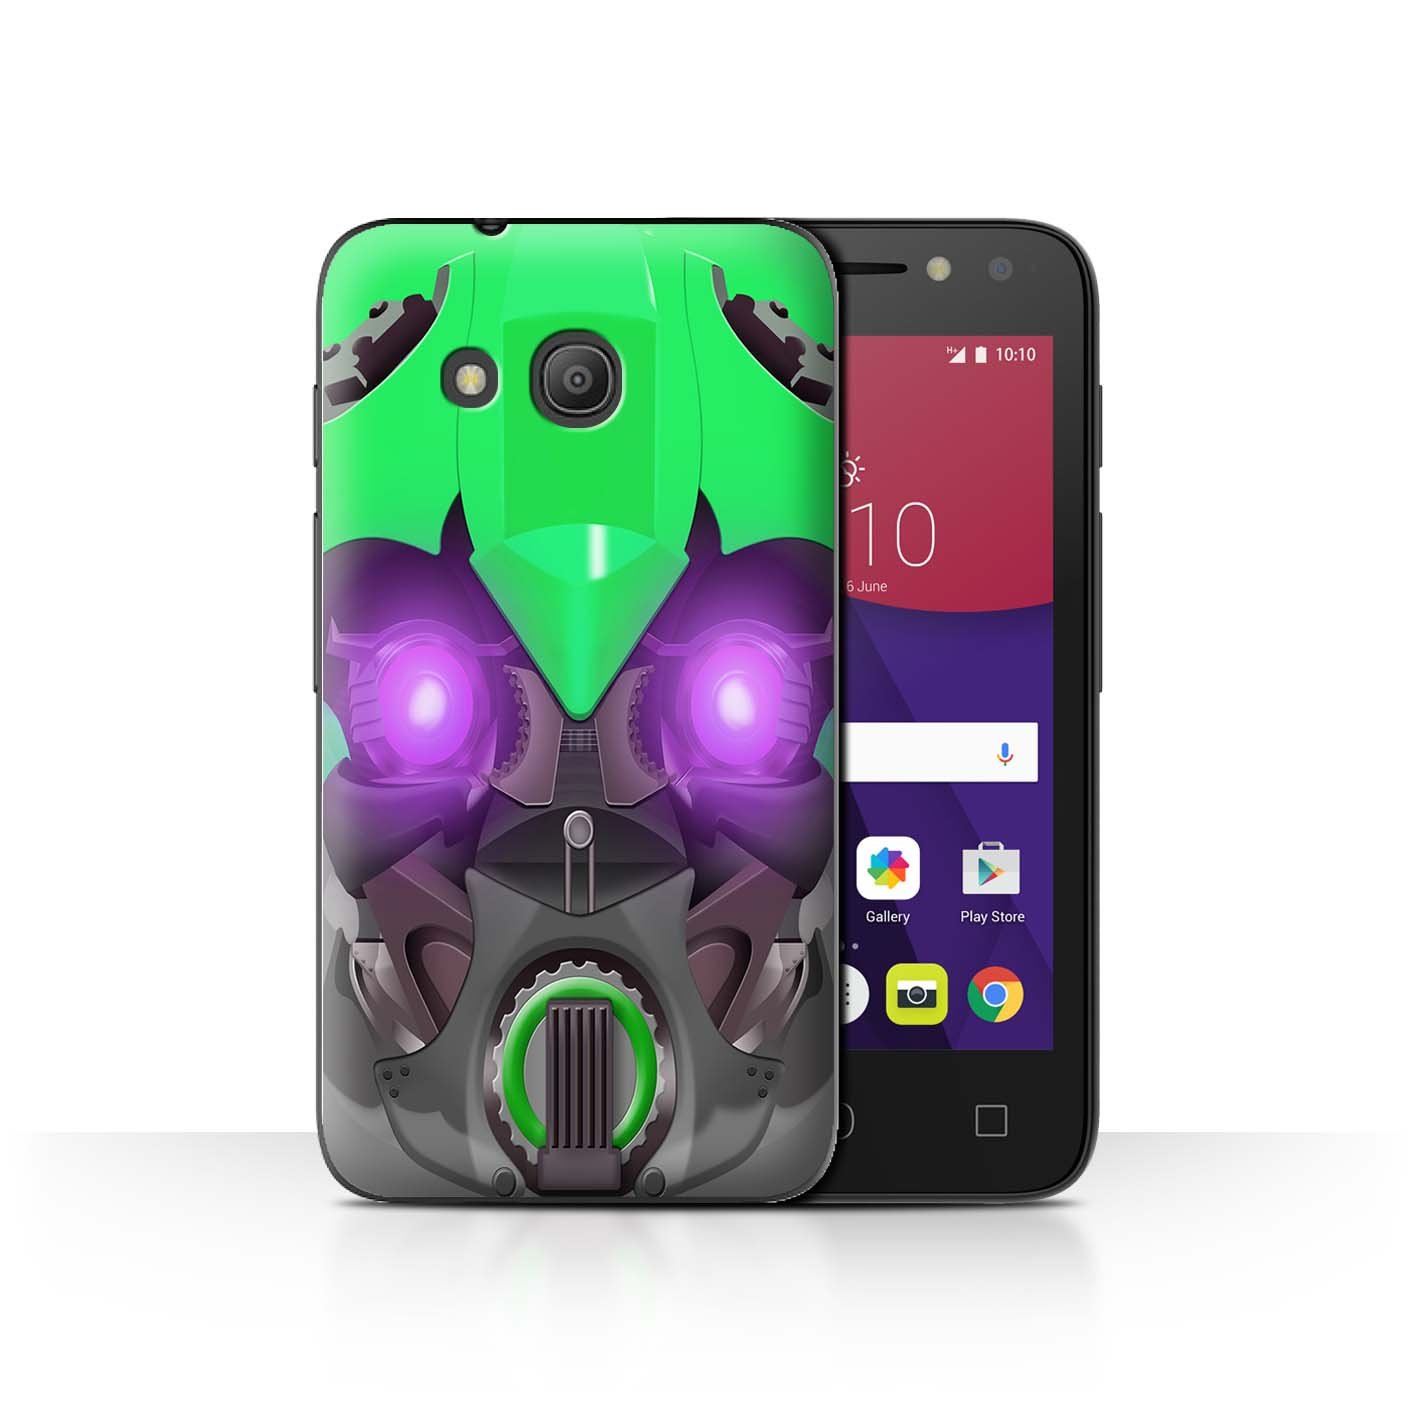 STUFF4-Back-Case-Cover-Skin-for-Alcatel-Pixi-4-4-034-Robots